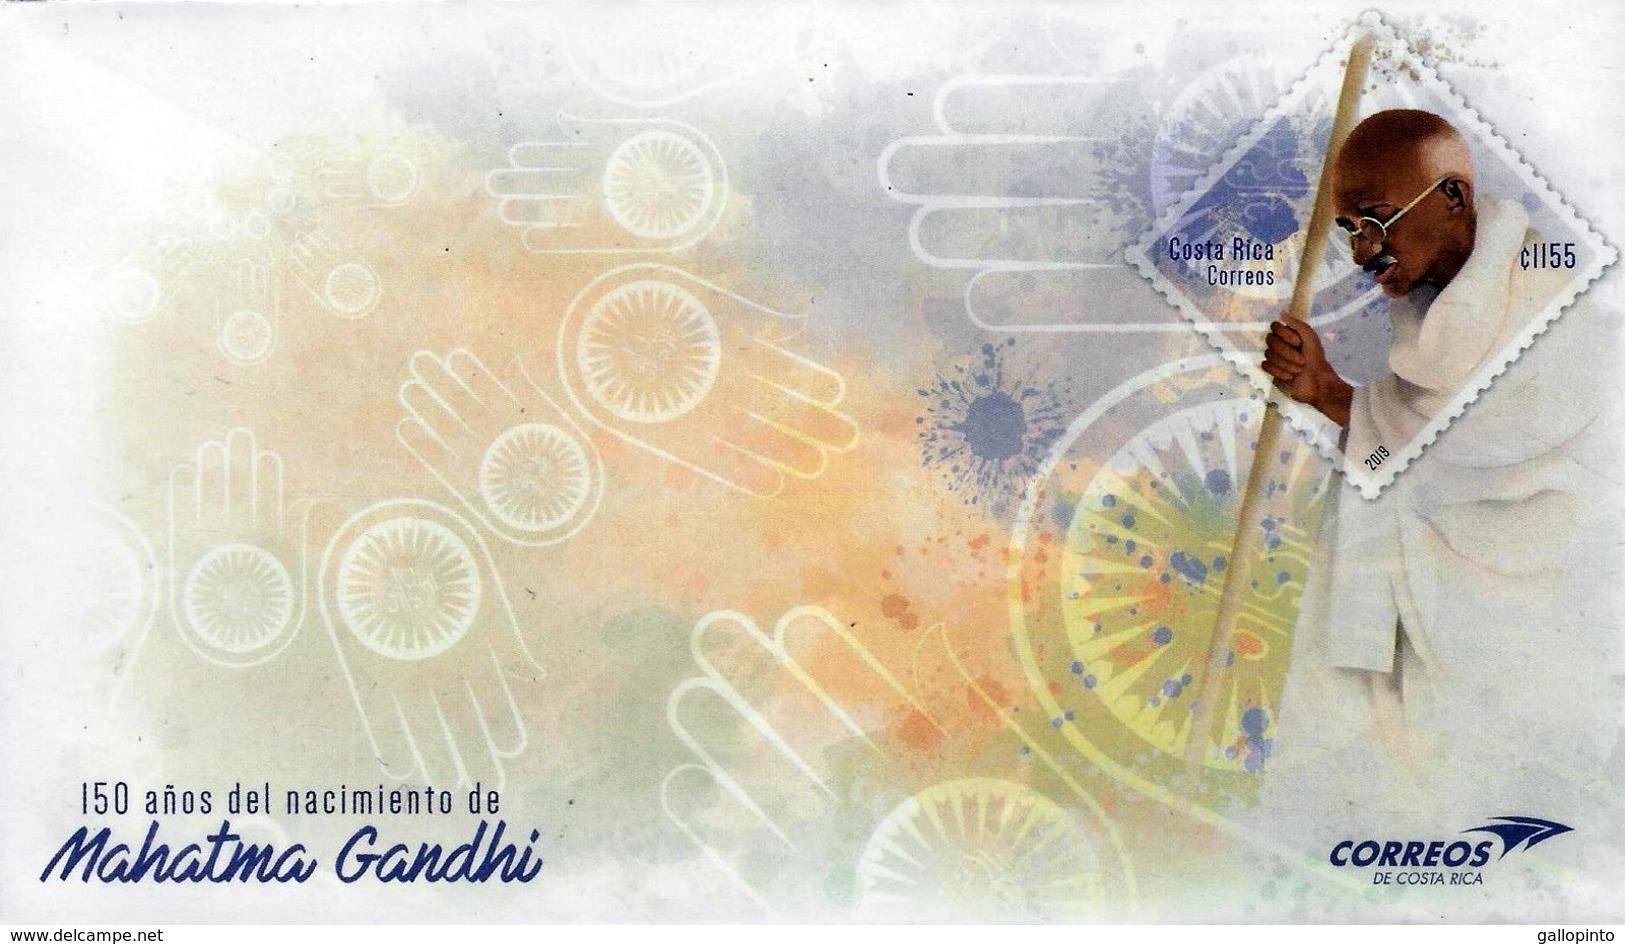 COSTA RICA 150 YEARS BIRTH Of MAHATMA GANDHI PREPAID COVER 2019 - Mahatma Gandhi